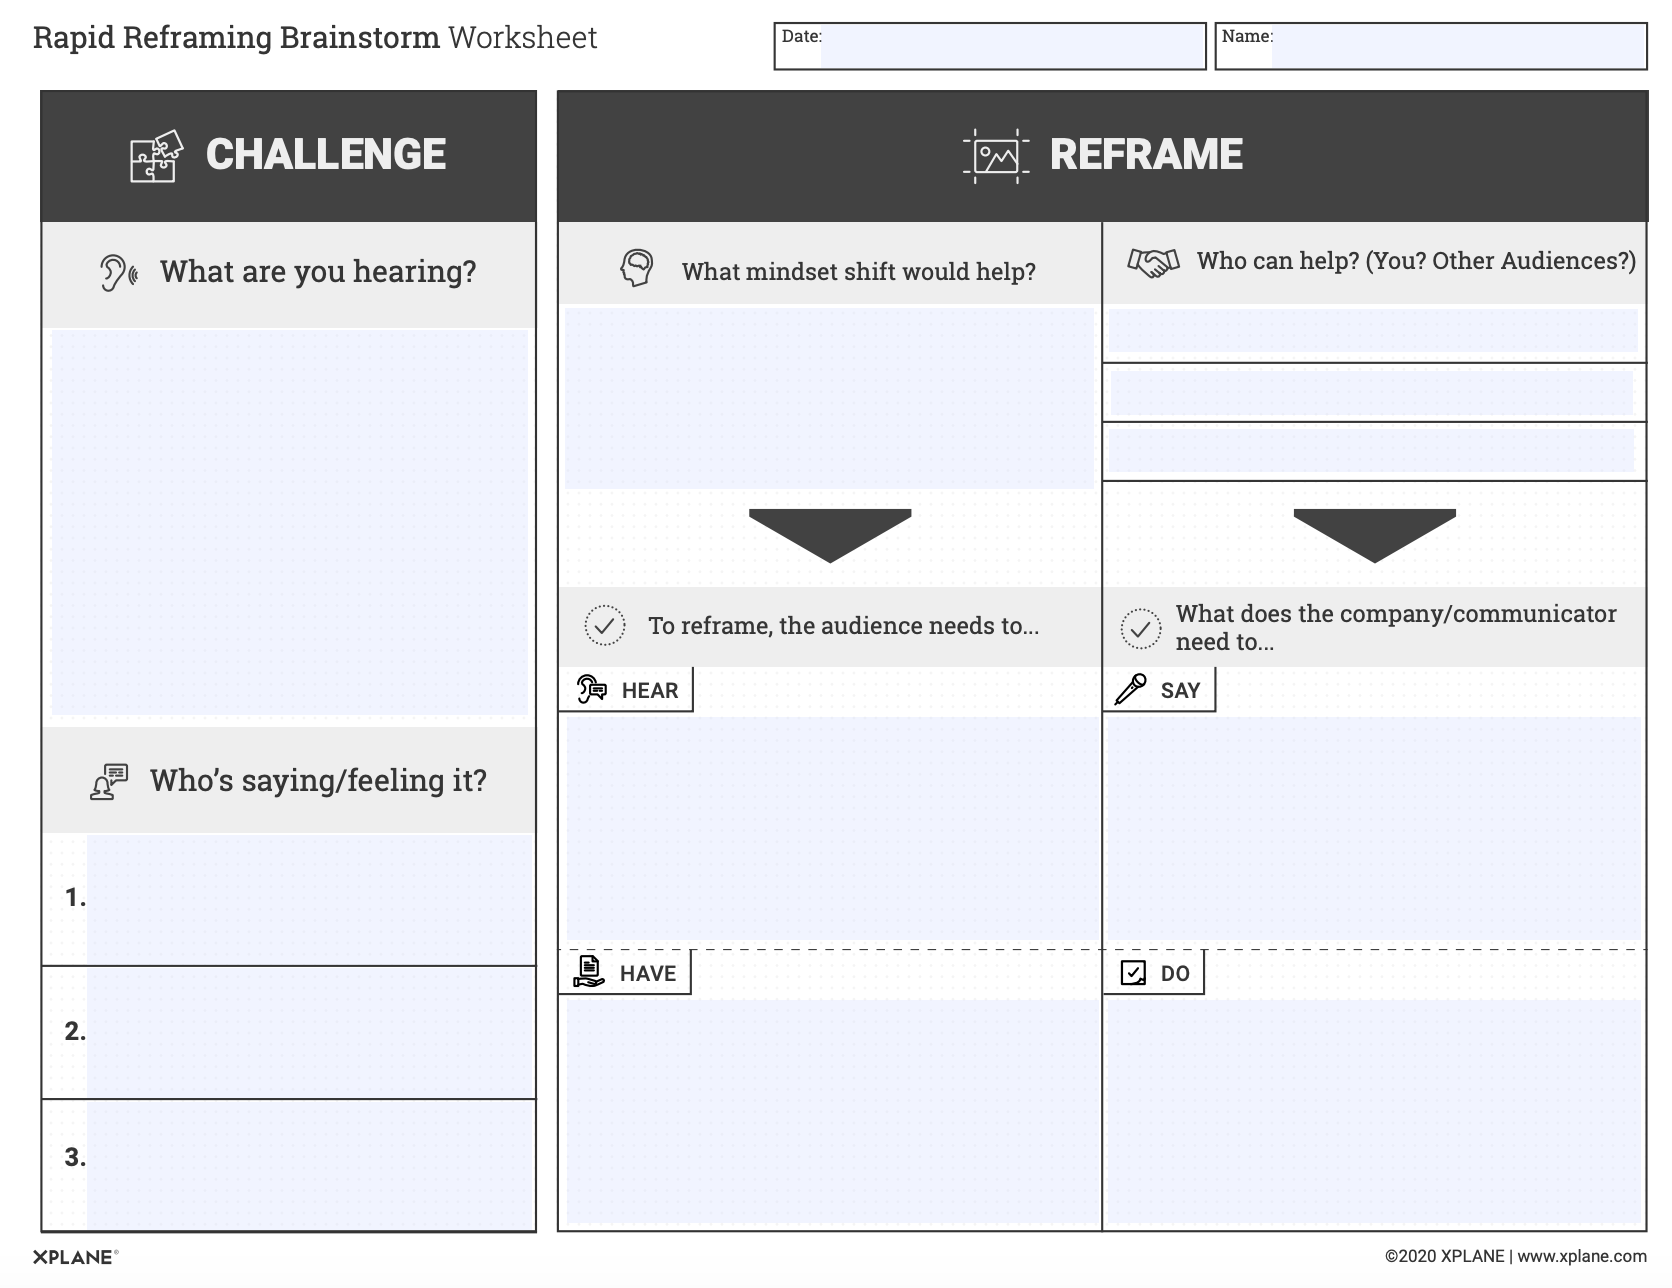 Rapid Reframing Brainstorm Worksheet_Screenshot